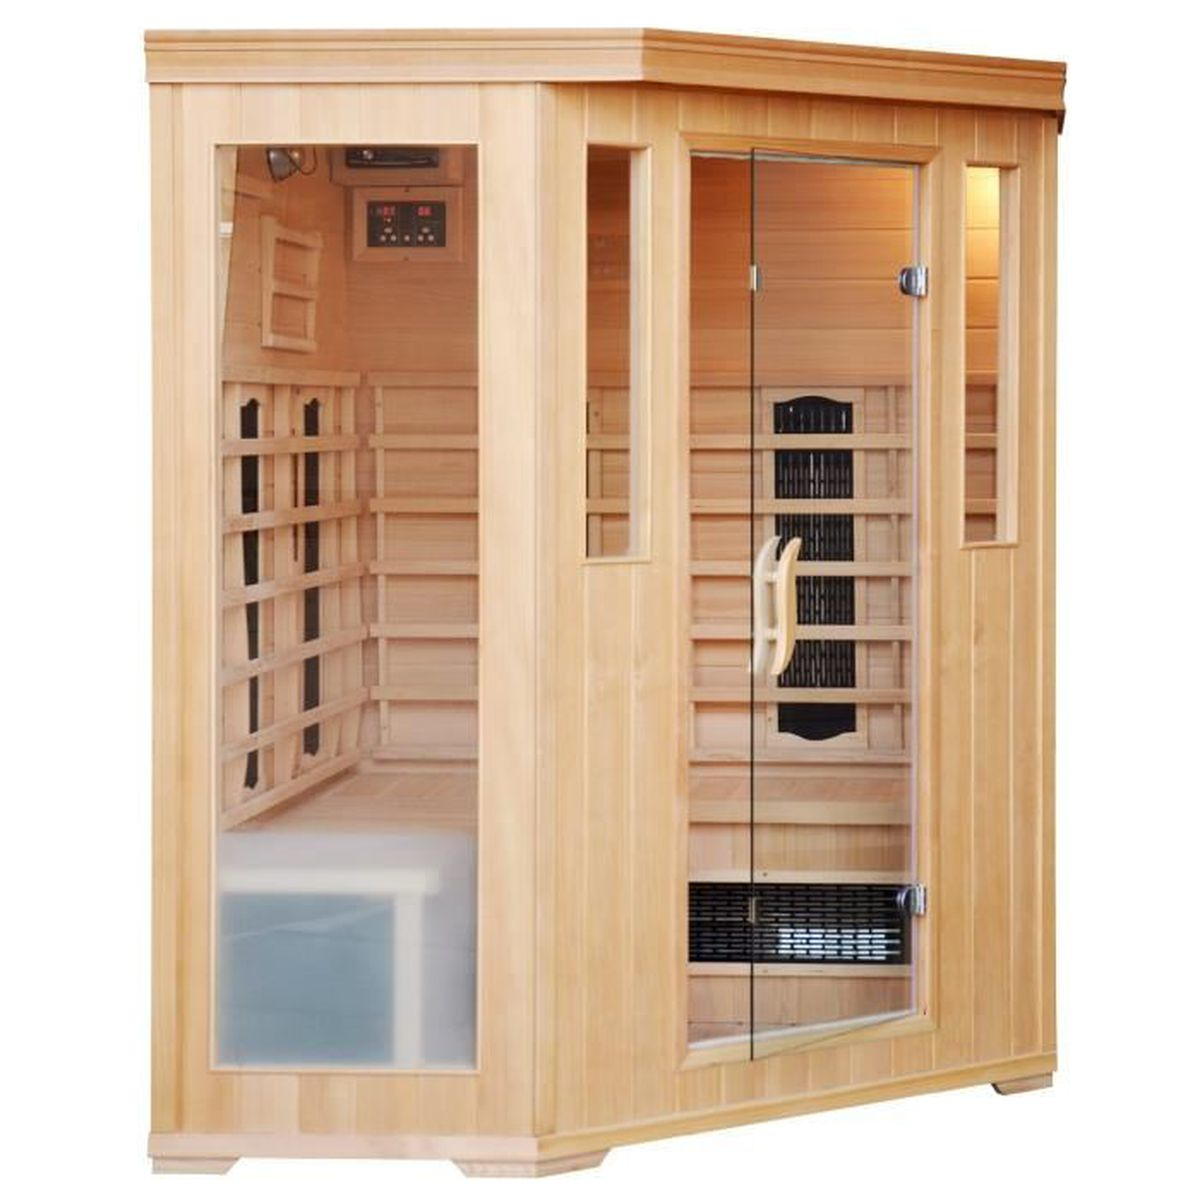 Cabine Salle De Bain Complete brevik cabine sauna luxe infrarouge 3/4 places - achat